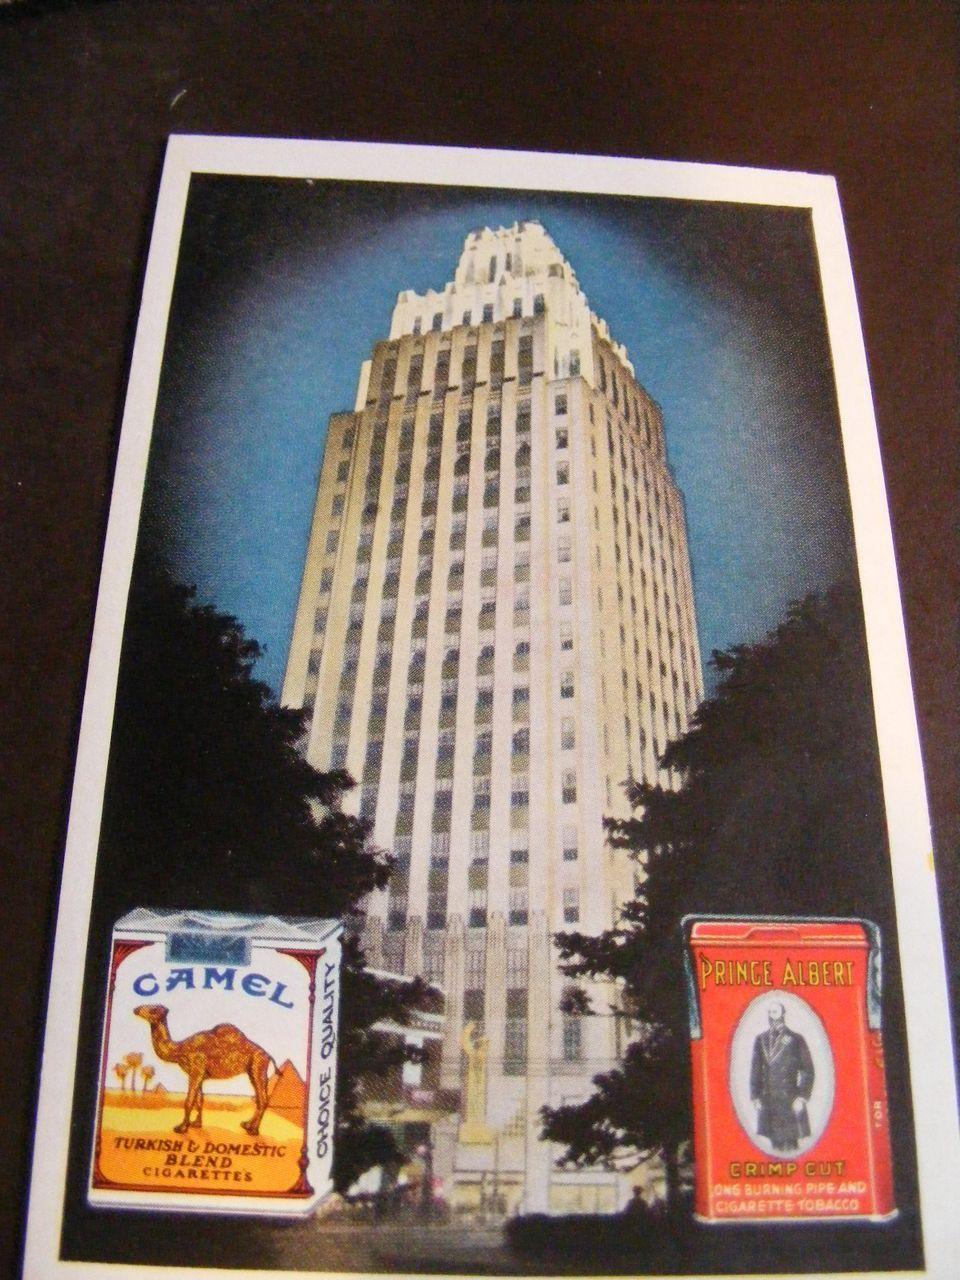 Camel & Prince Albert, Winston Salem Cigarette NC Postcard Tobacco 1950's